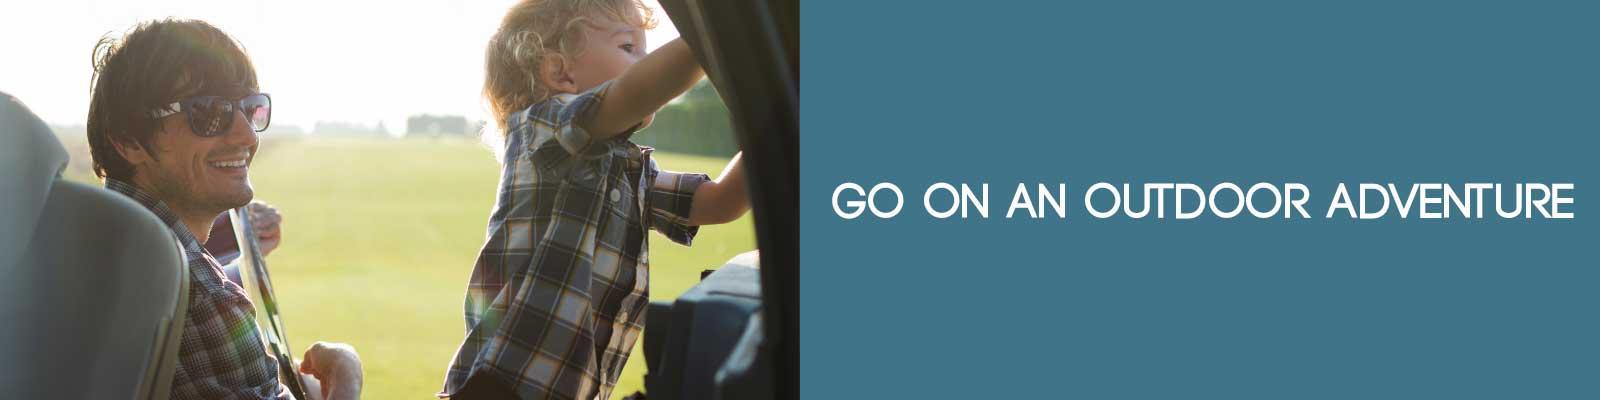 Go on an Outdoor Adventure